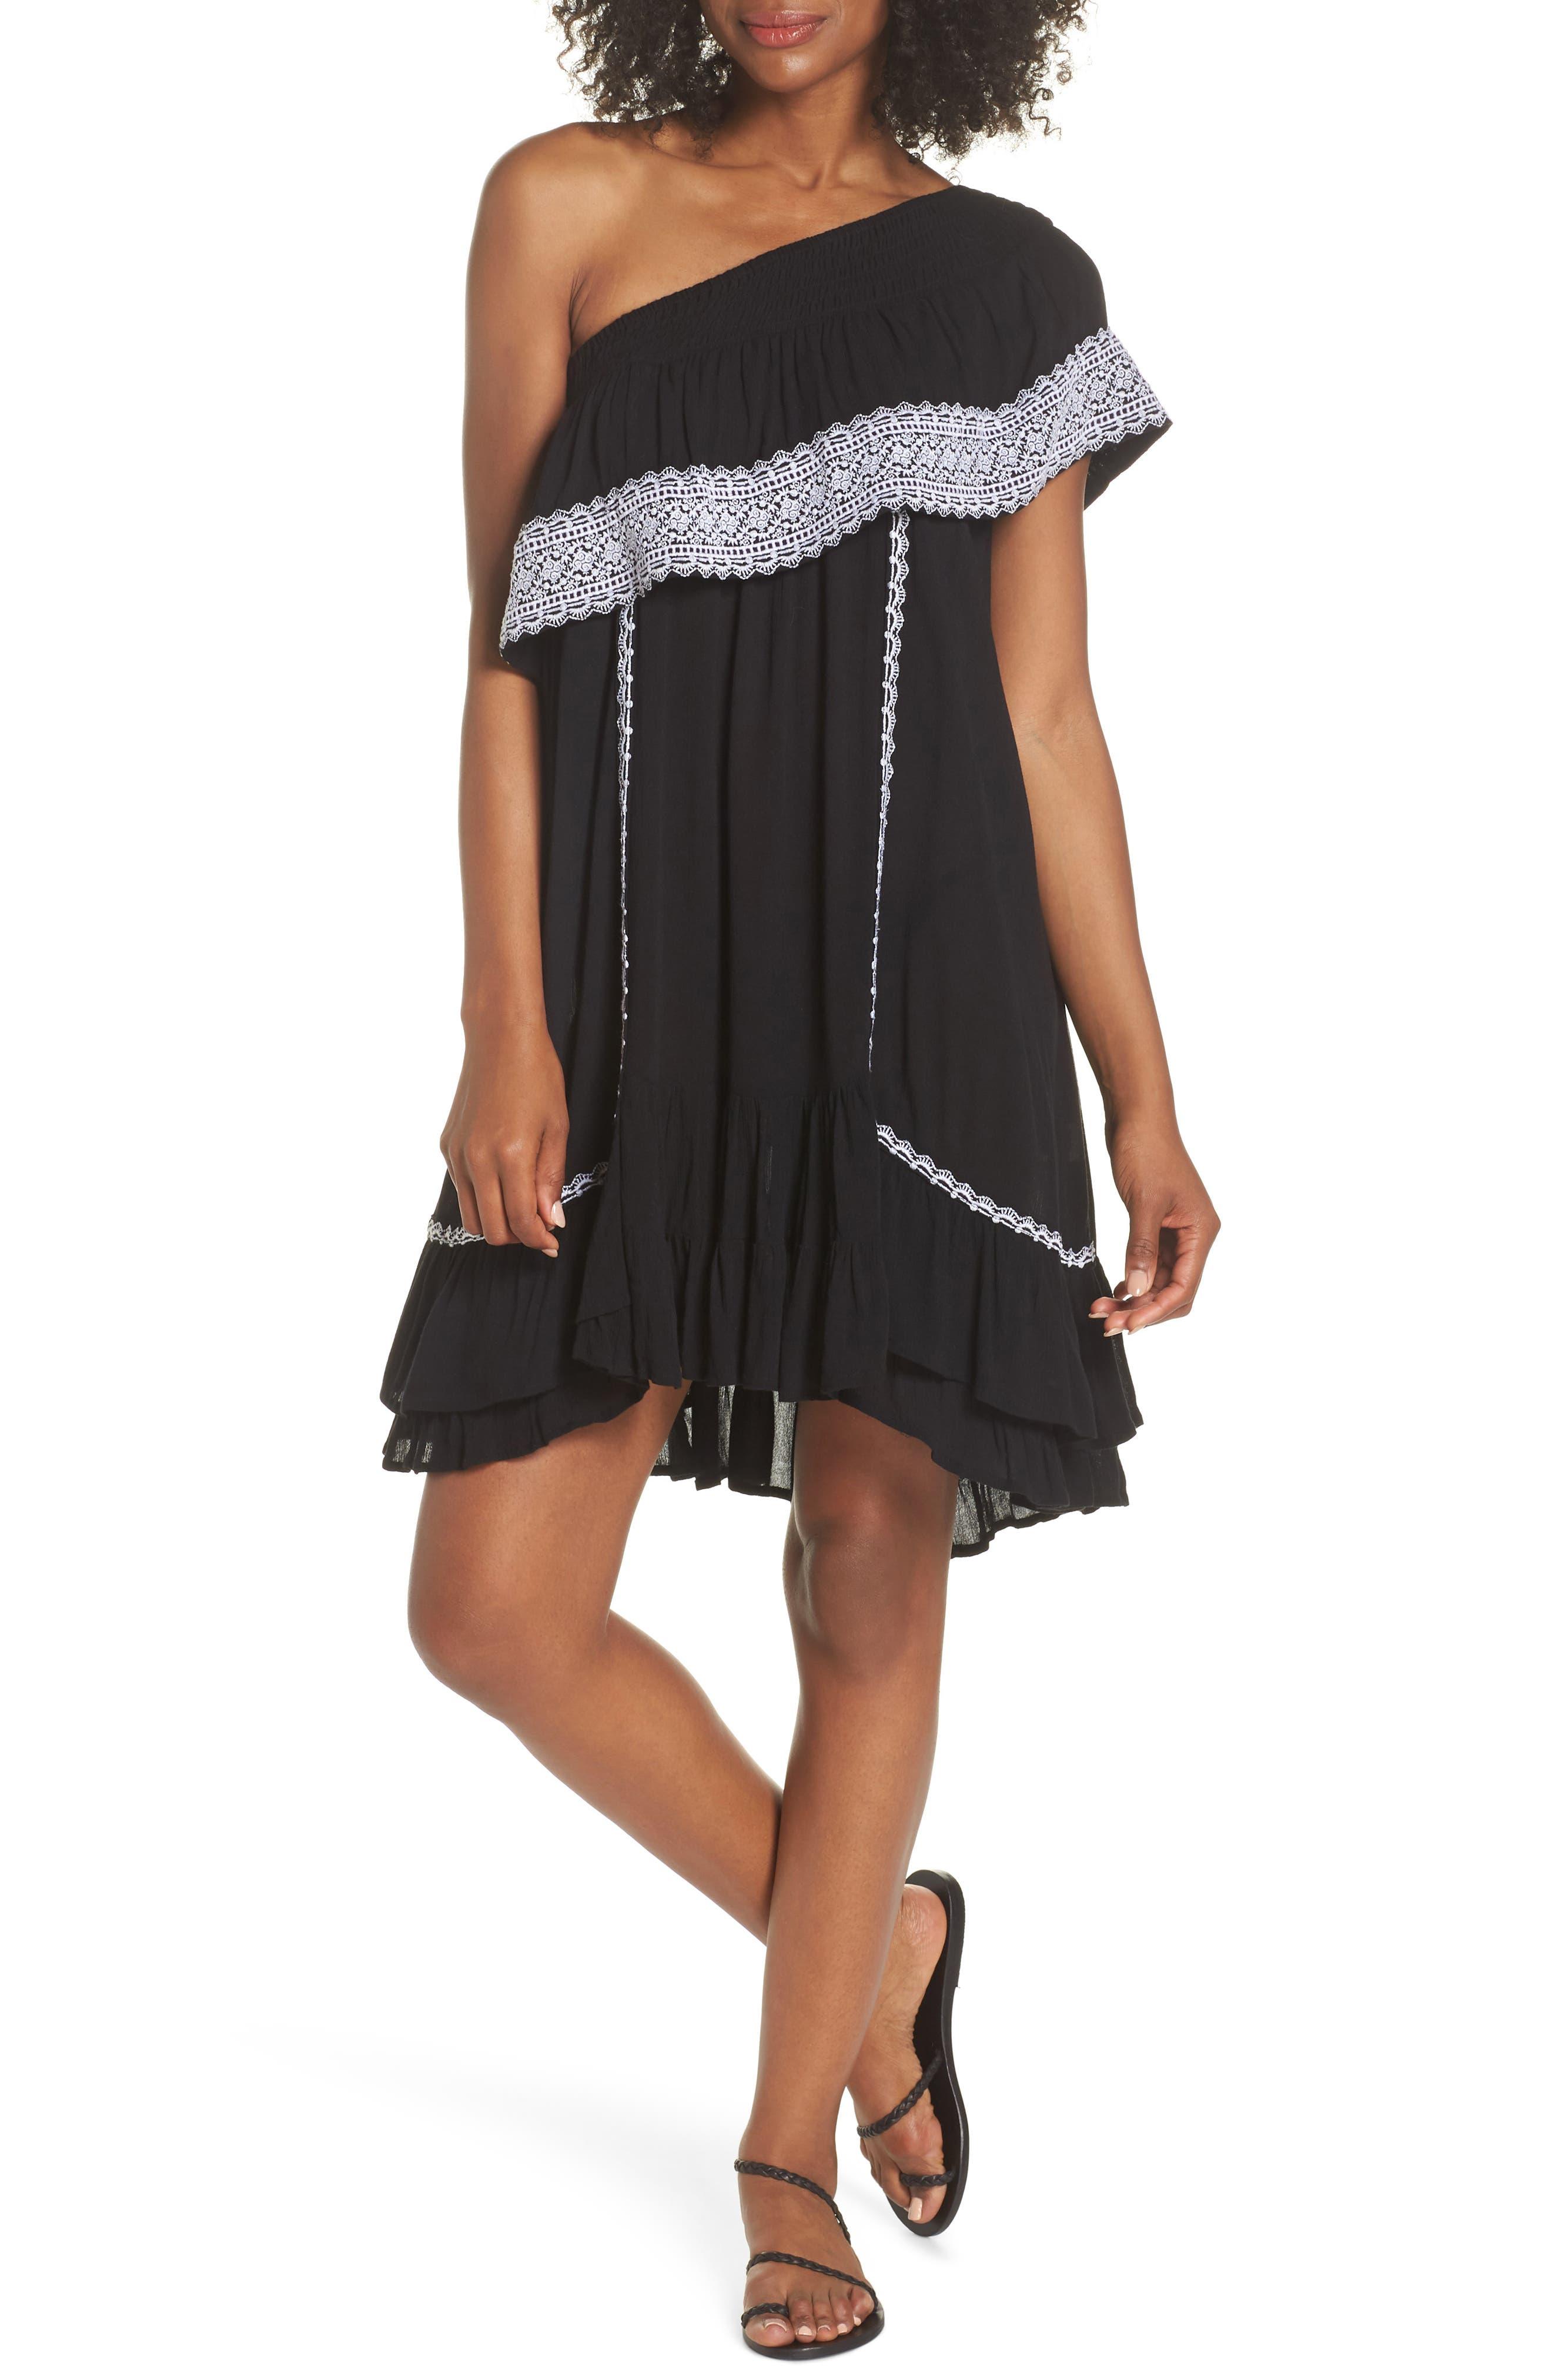 Main Image - Muche et Muchette Gavin One-Shoulder Cover-Up Dress